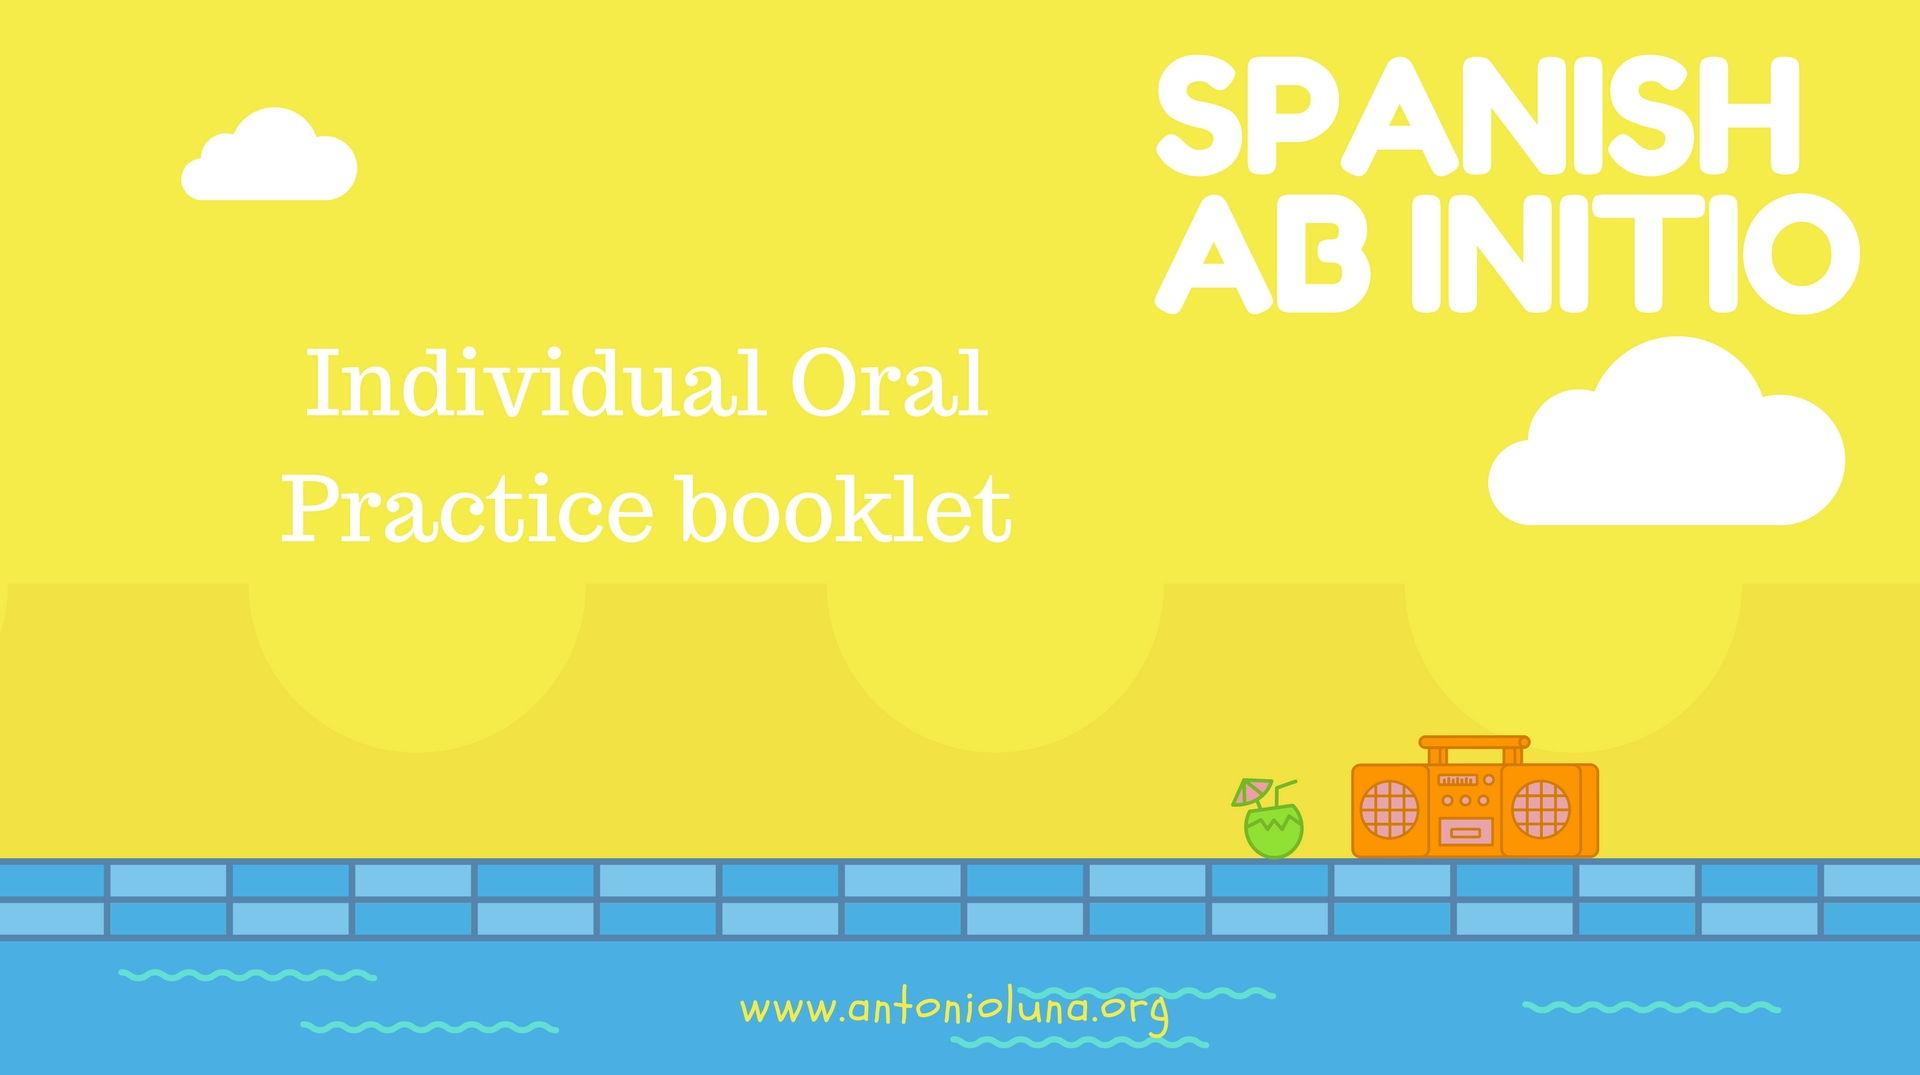 Individual Oral ab Initio booklet practice